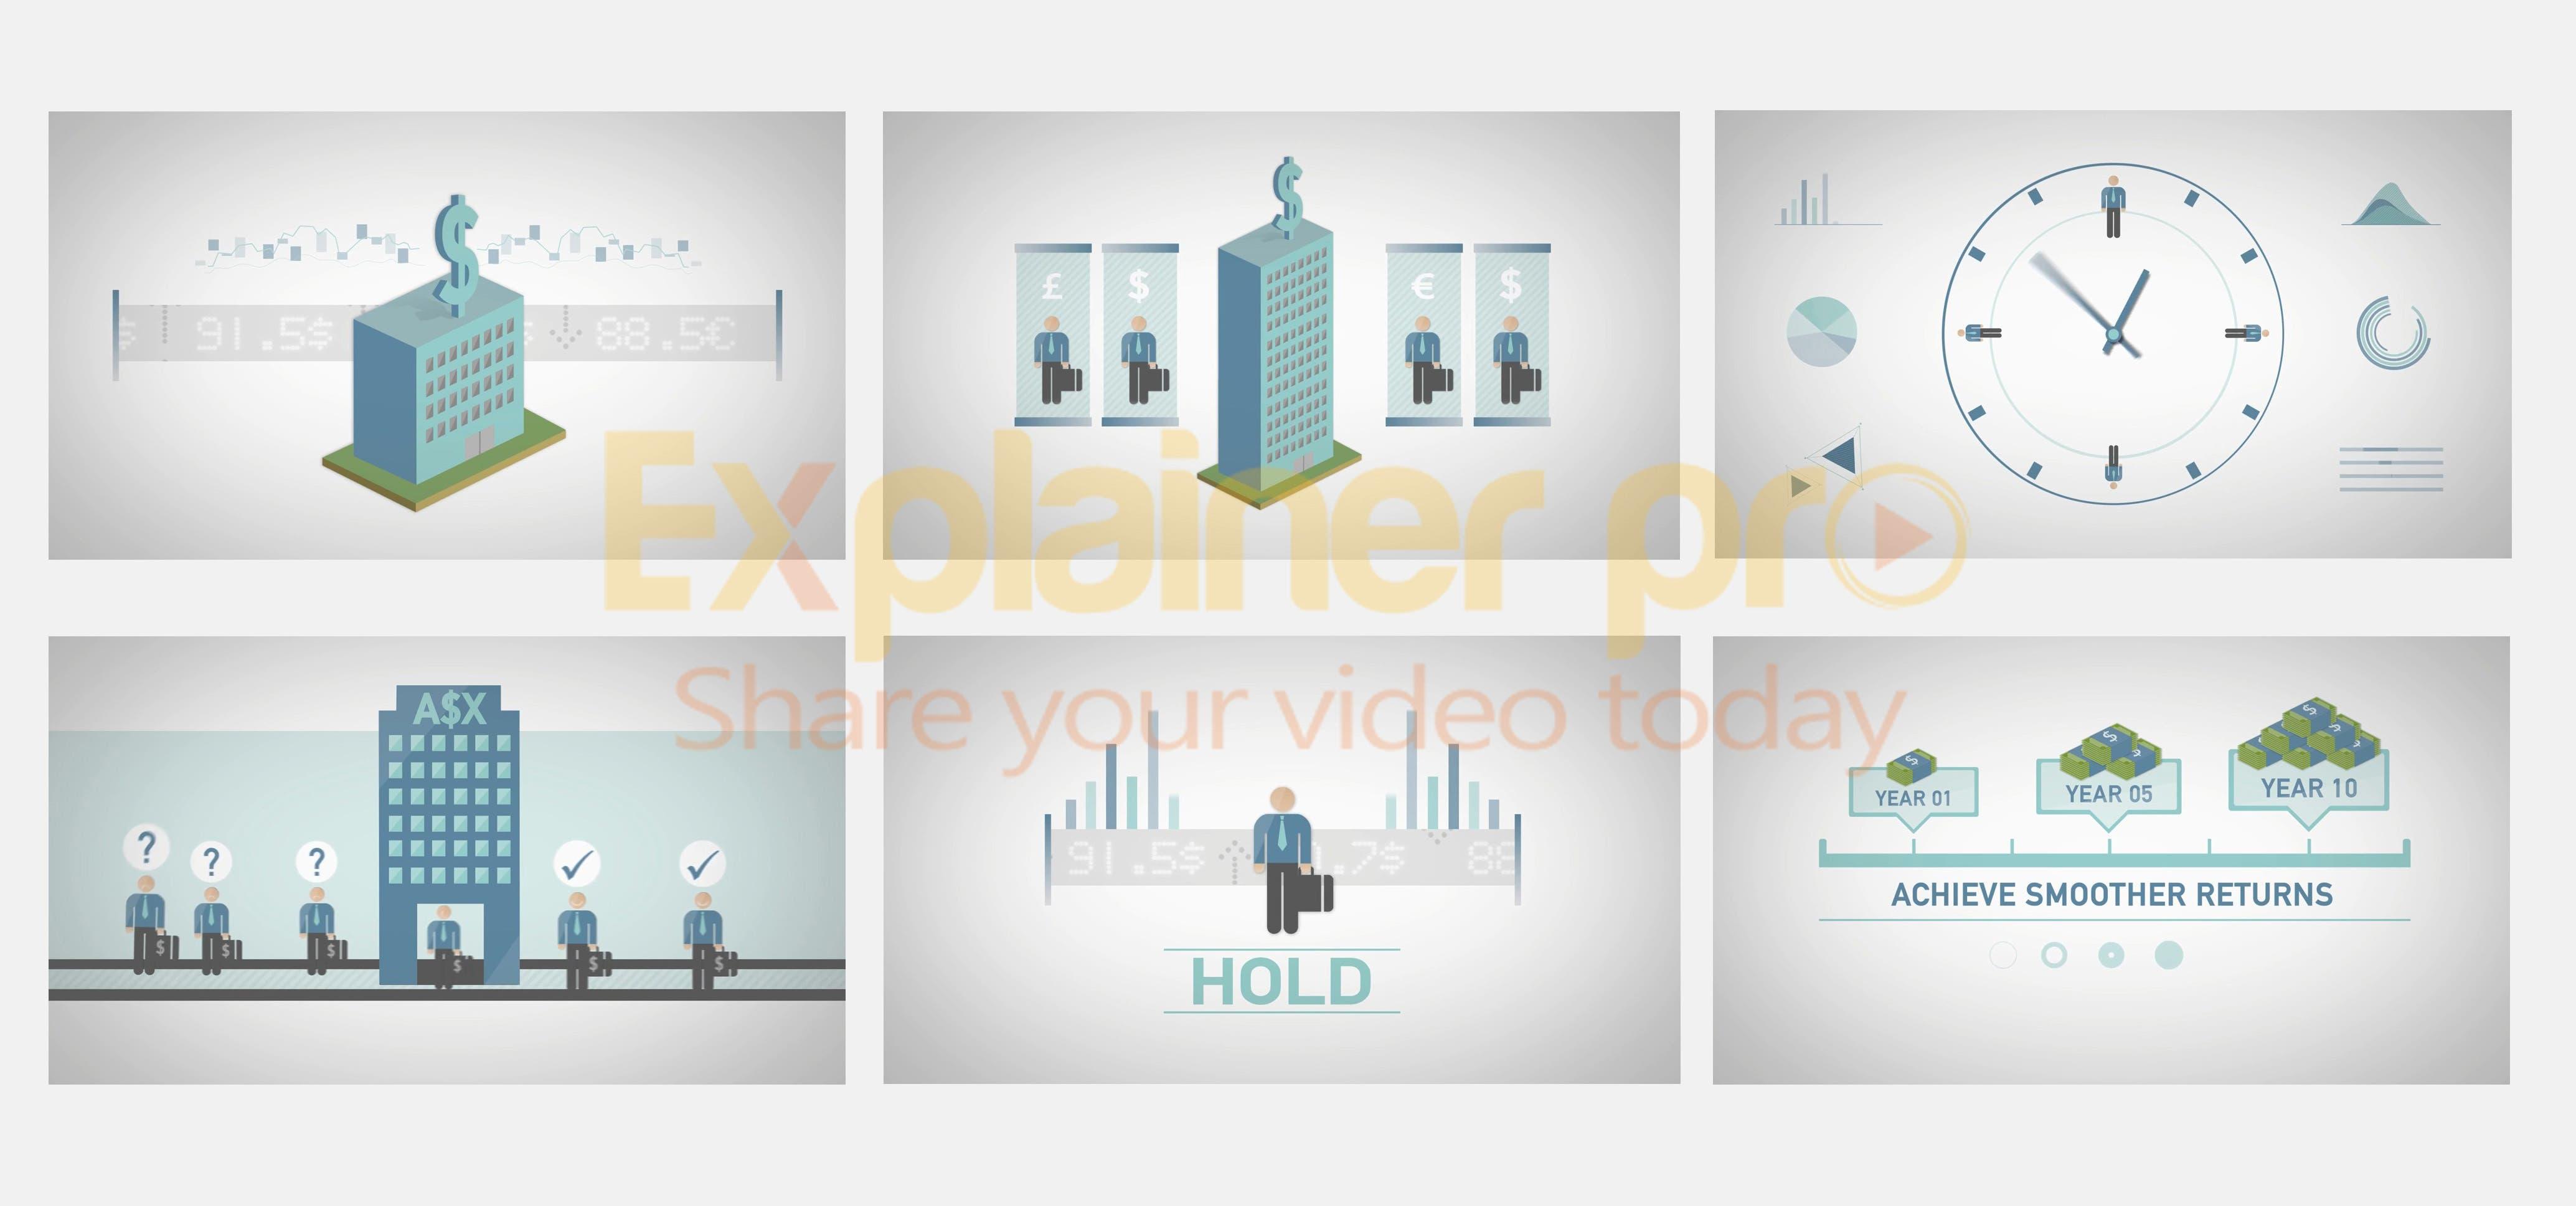 -----Promotional | Presentation Style-----